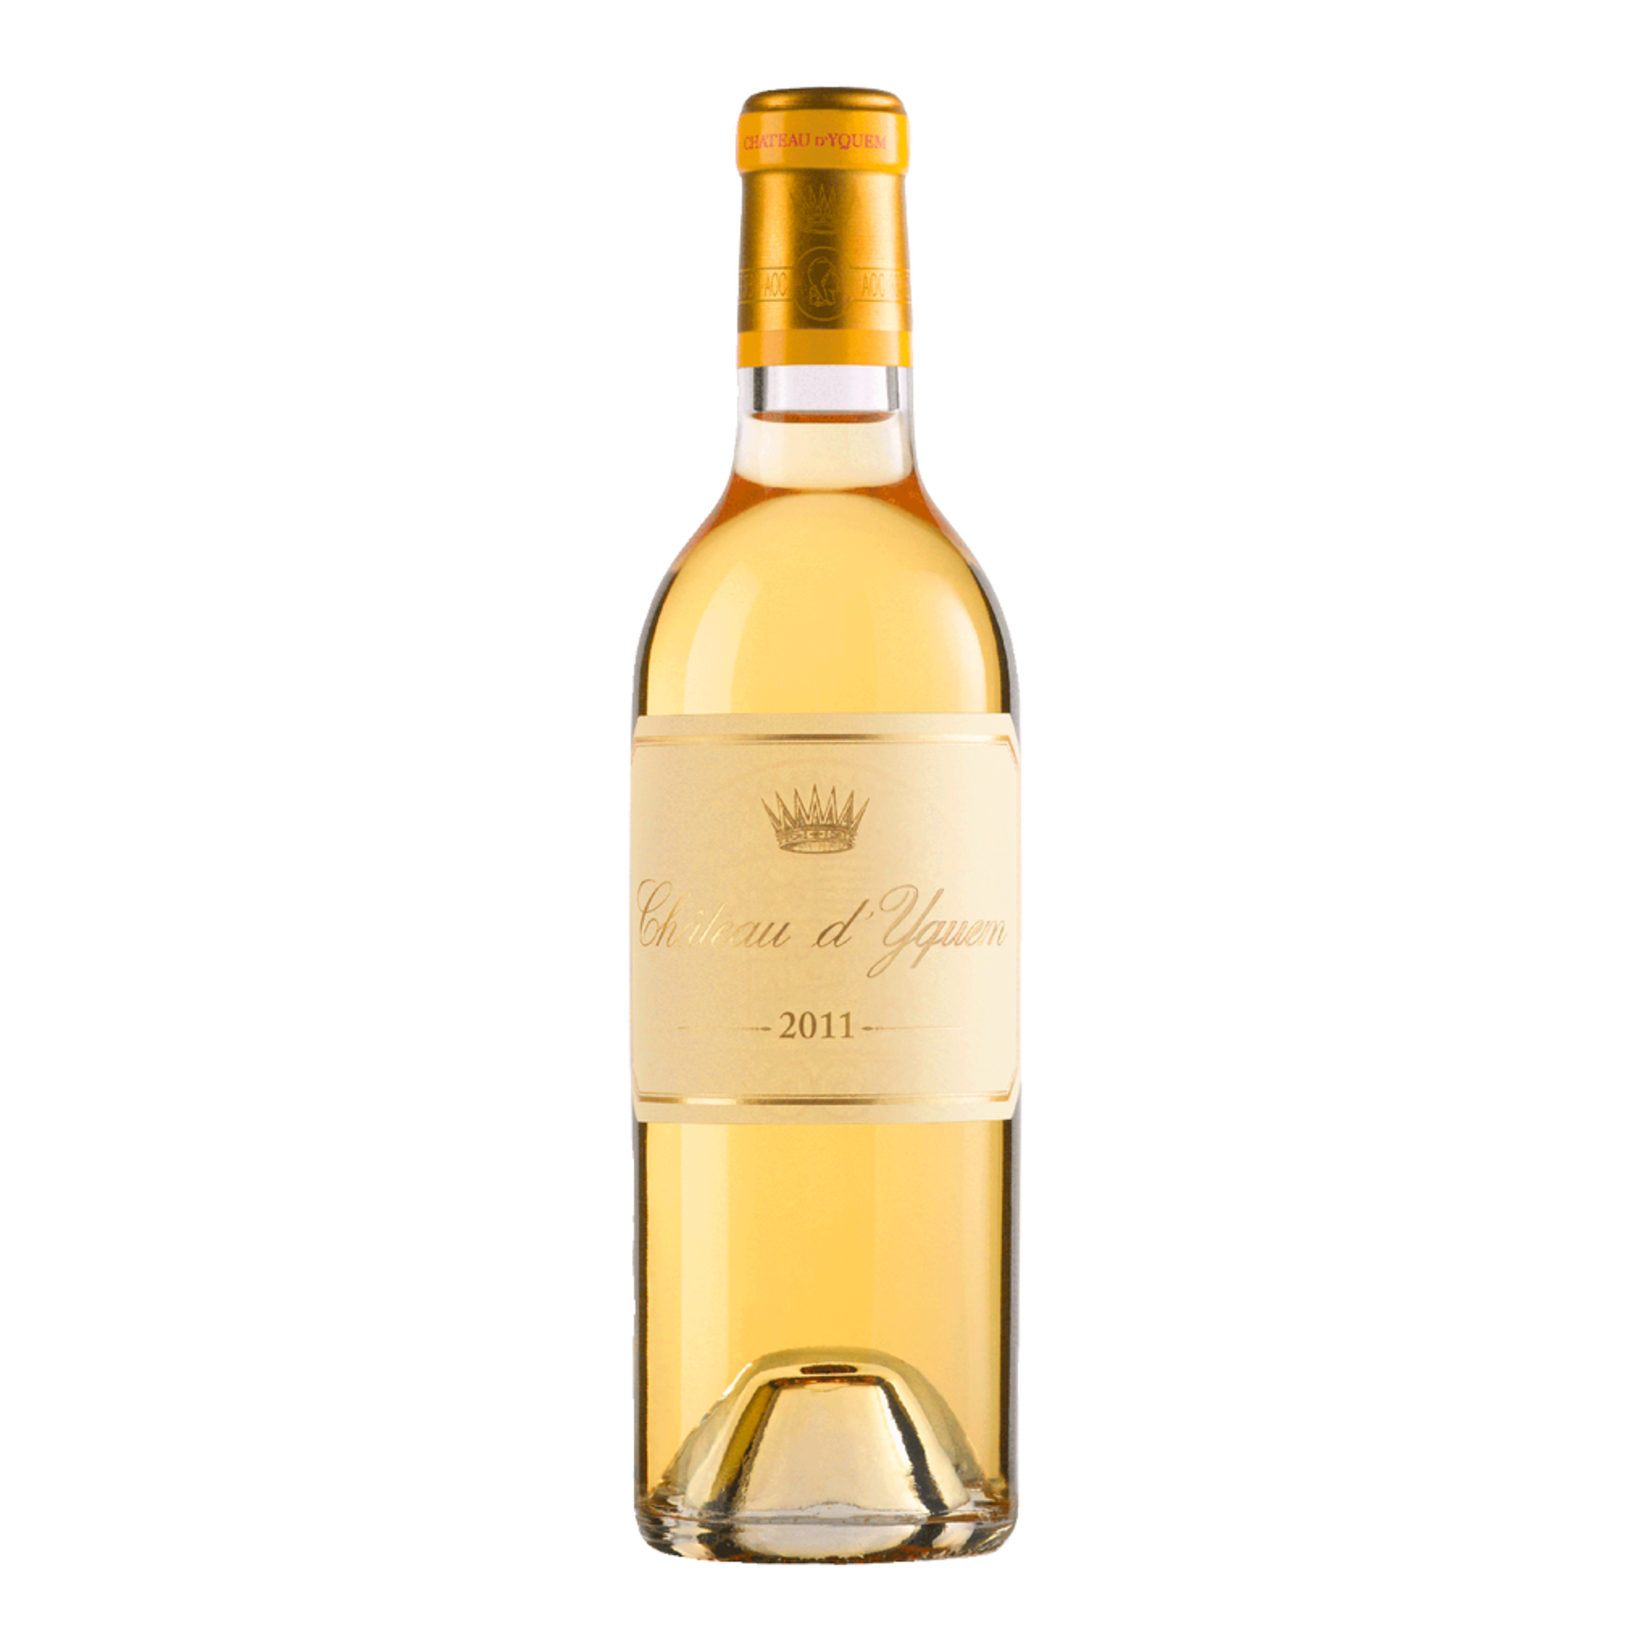 Wine Chateau d'Yquem 2011